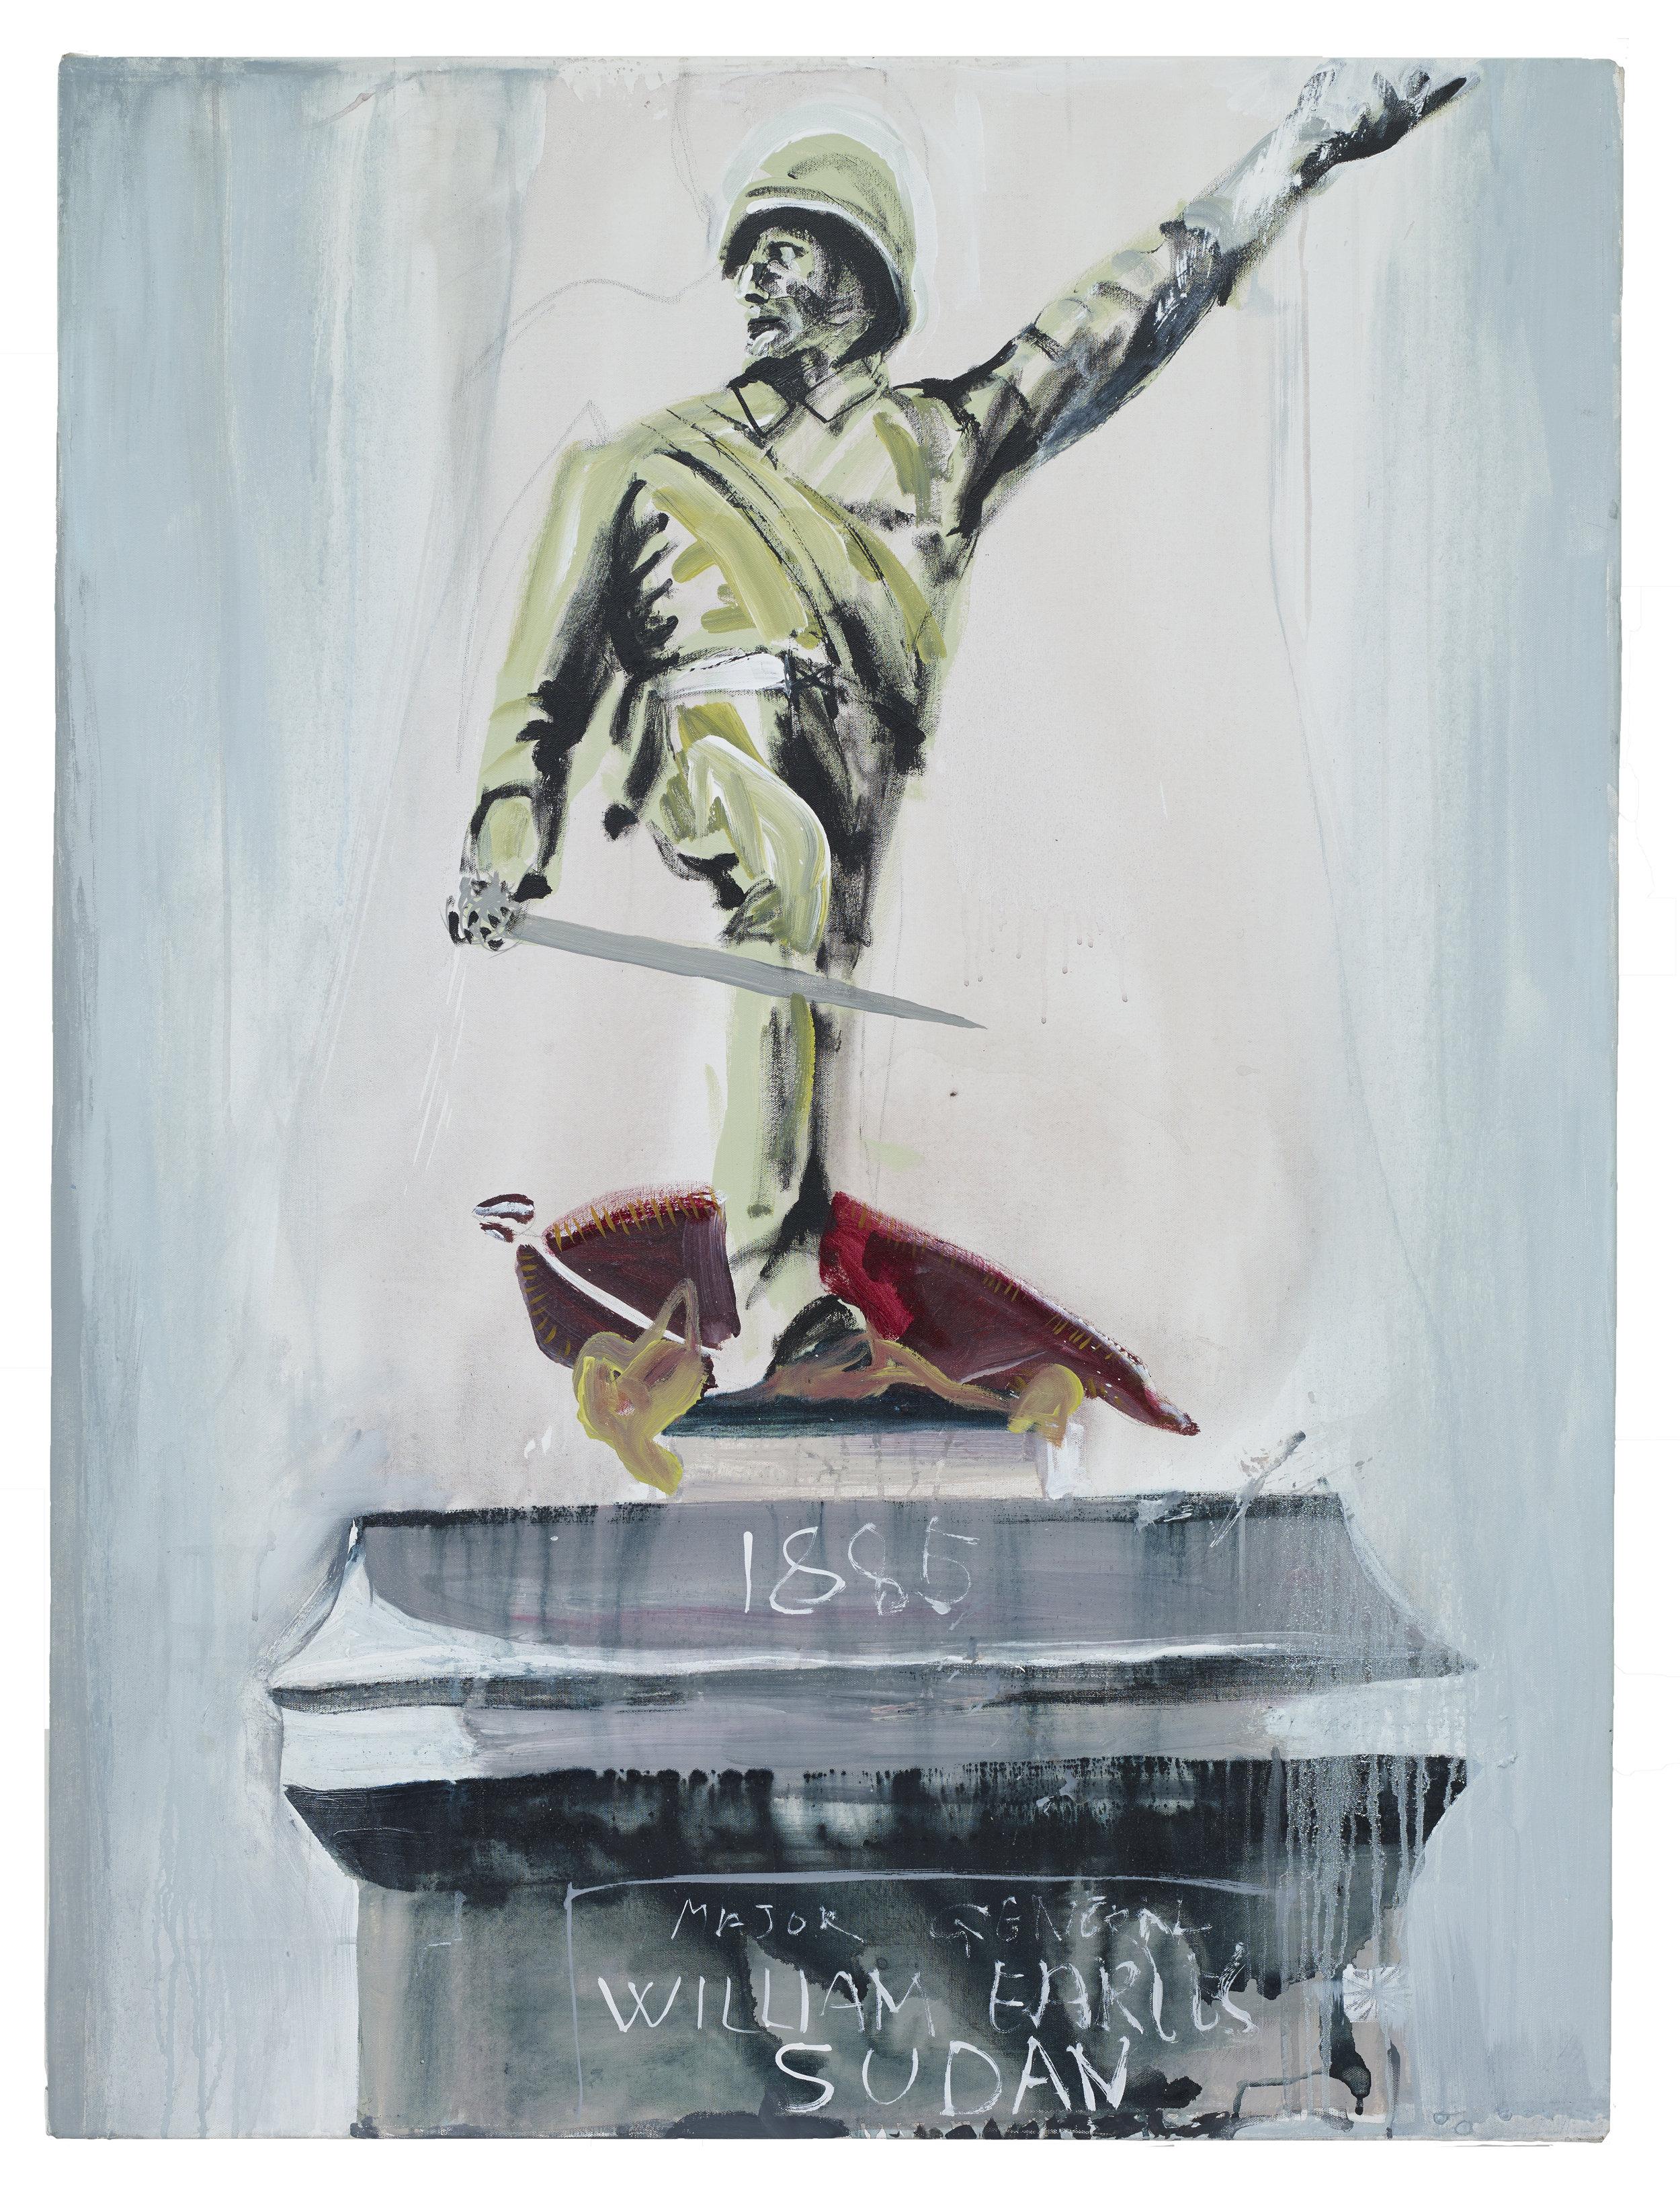 Brian Maguire  Mr William Earles, Sudan 1880 ,  2018 Acrylic on canvas 120 x 92 cm